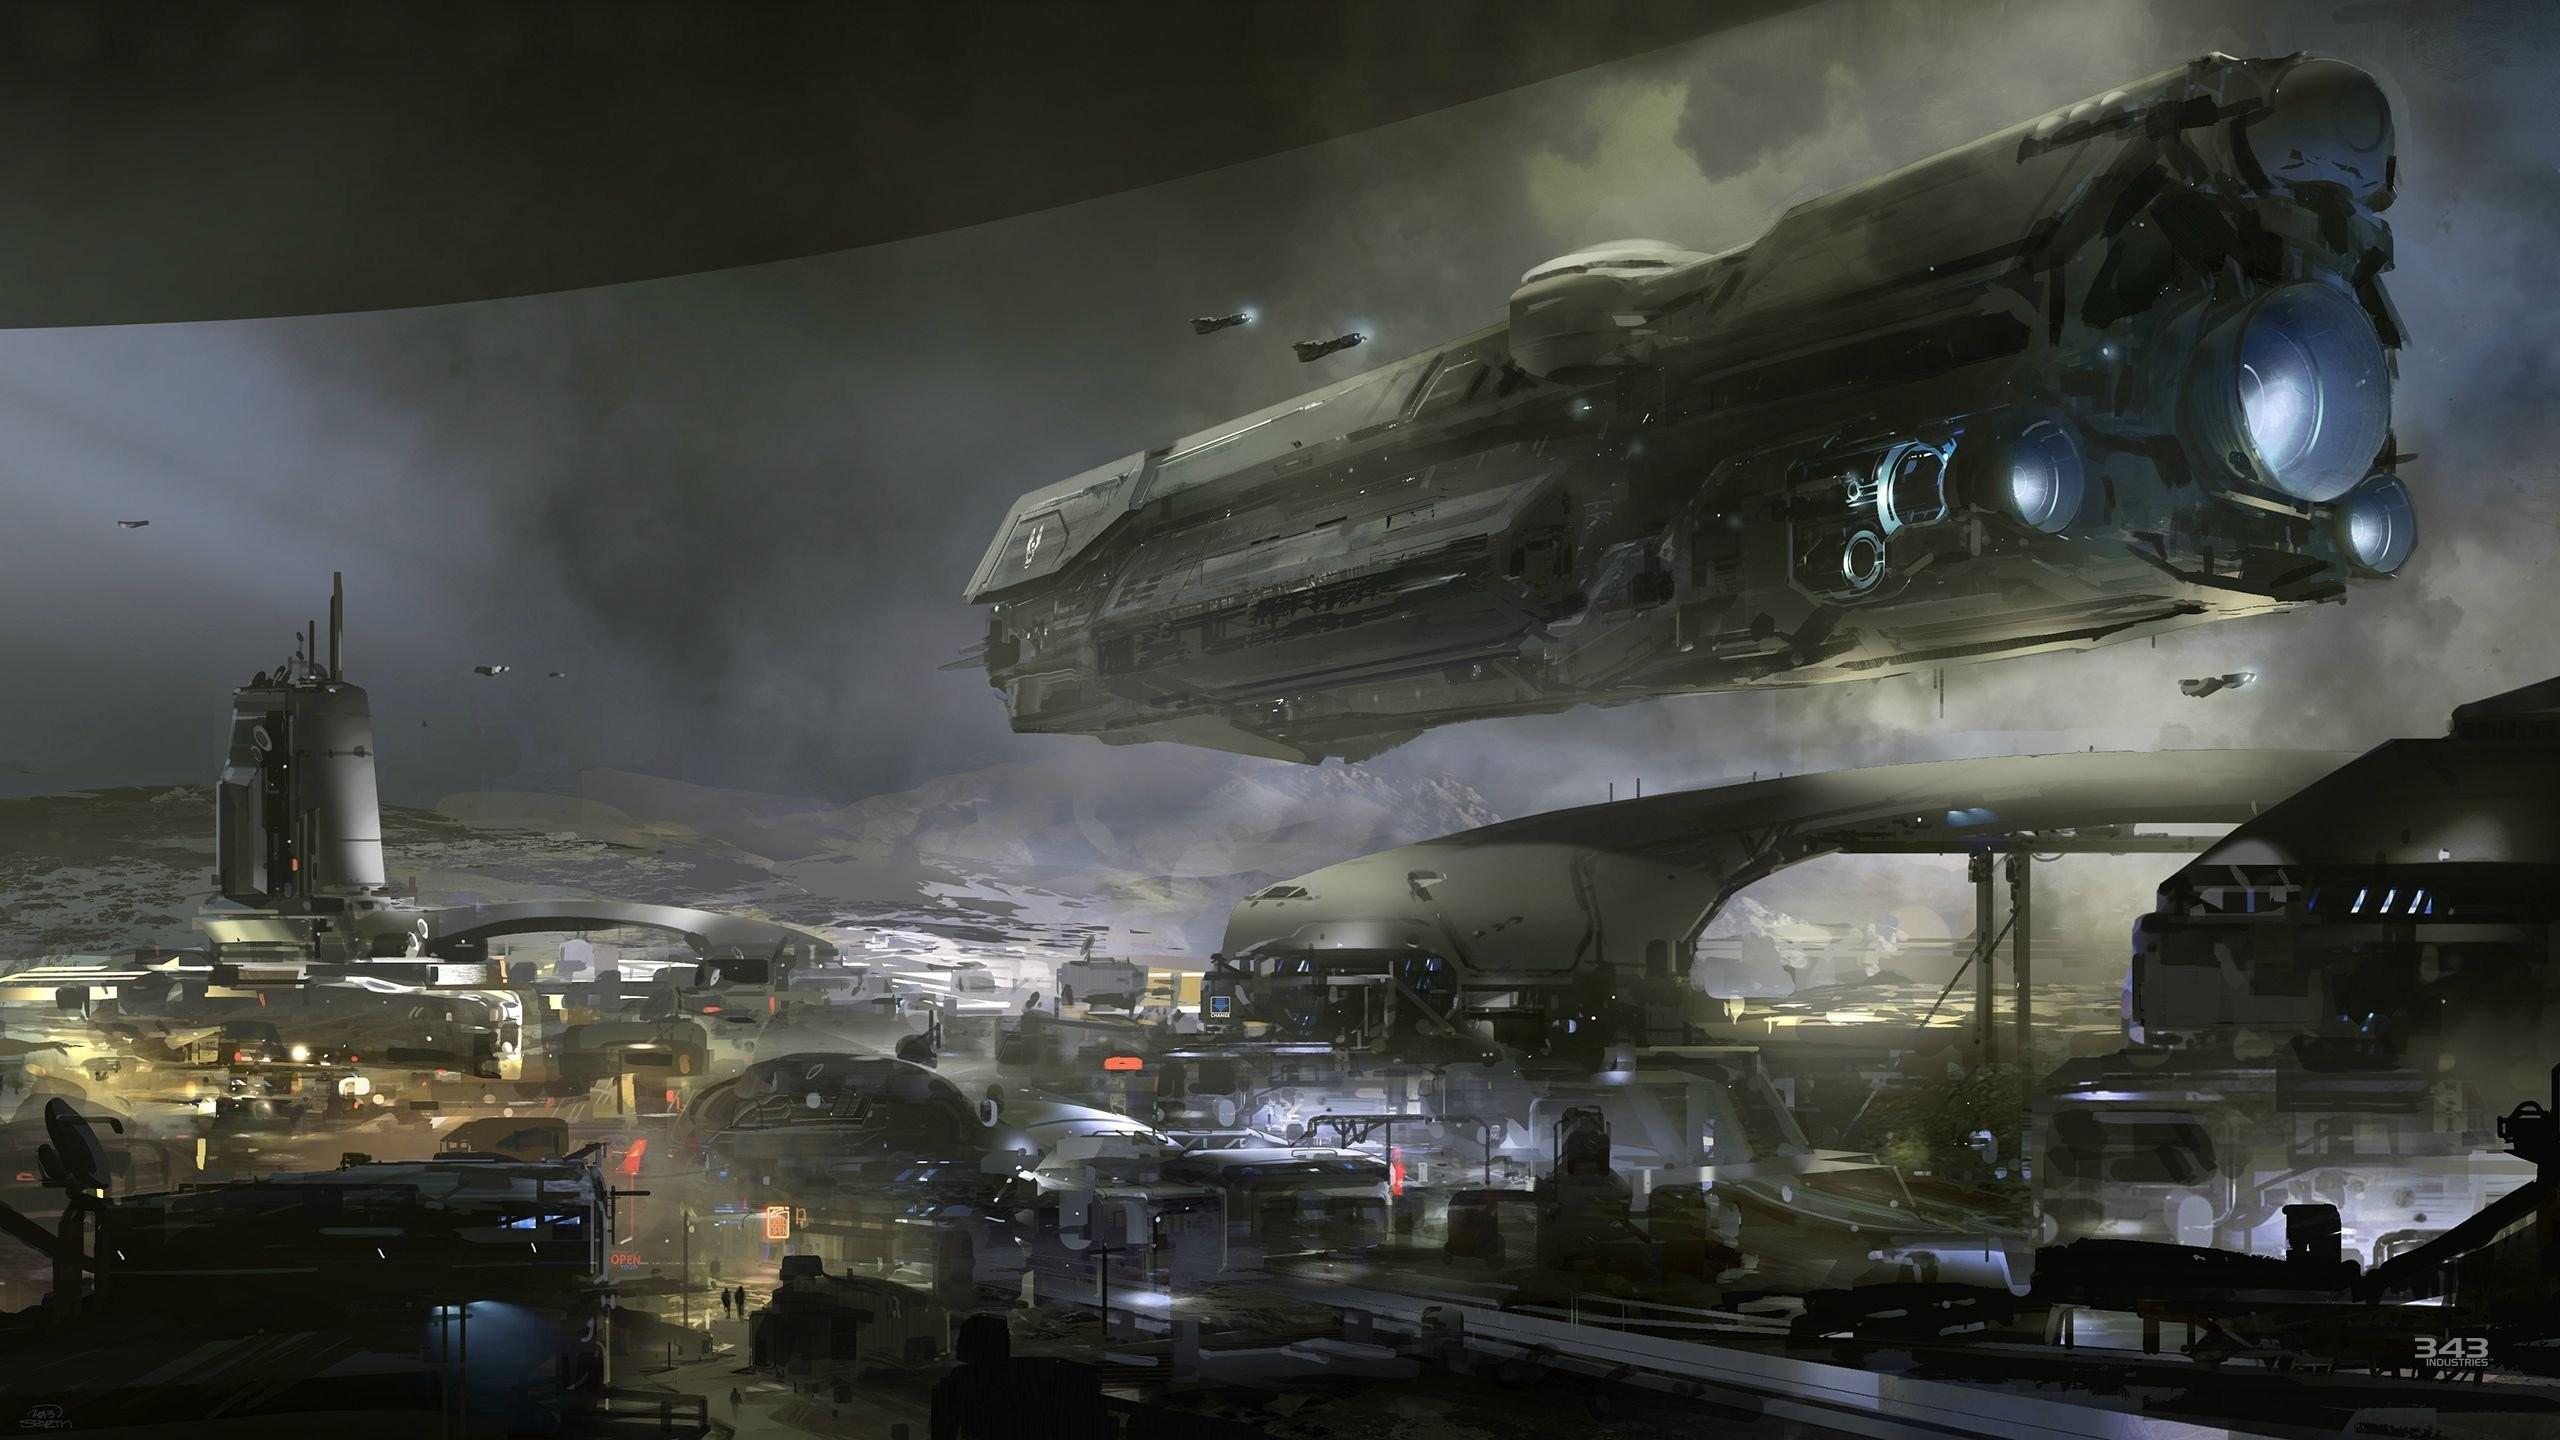 Halo Spaceships UNSC Infinity Digital Art